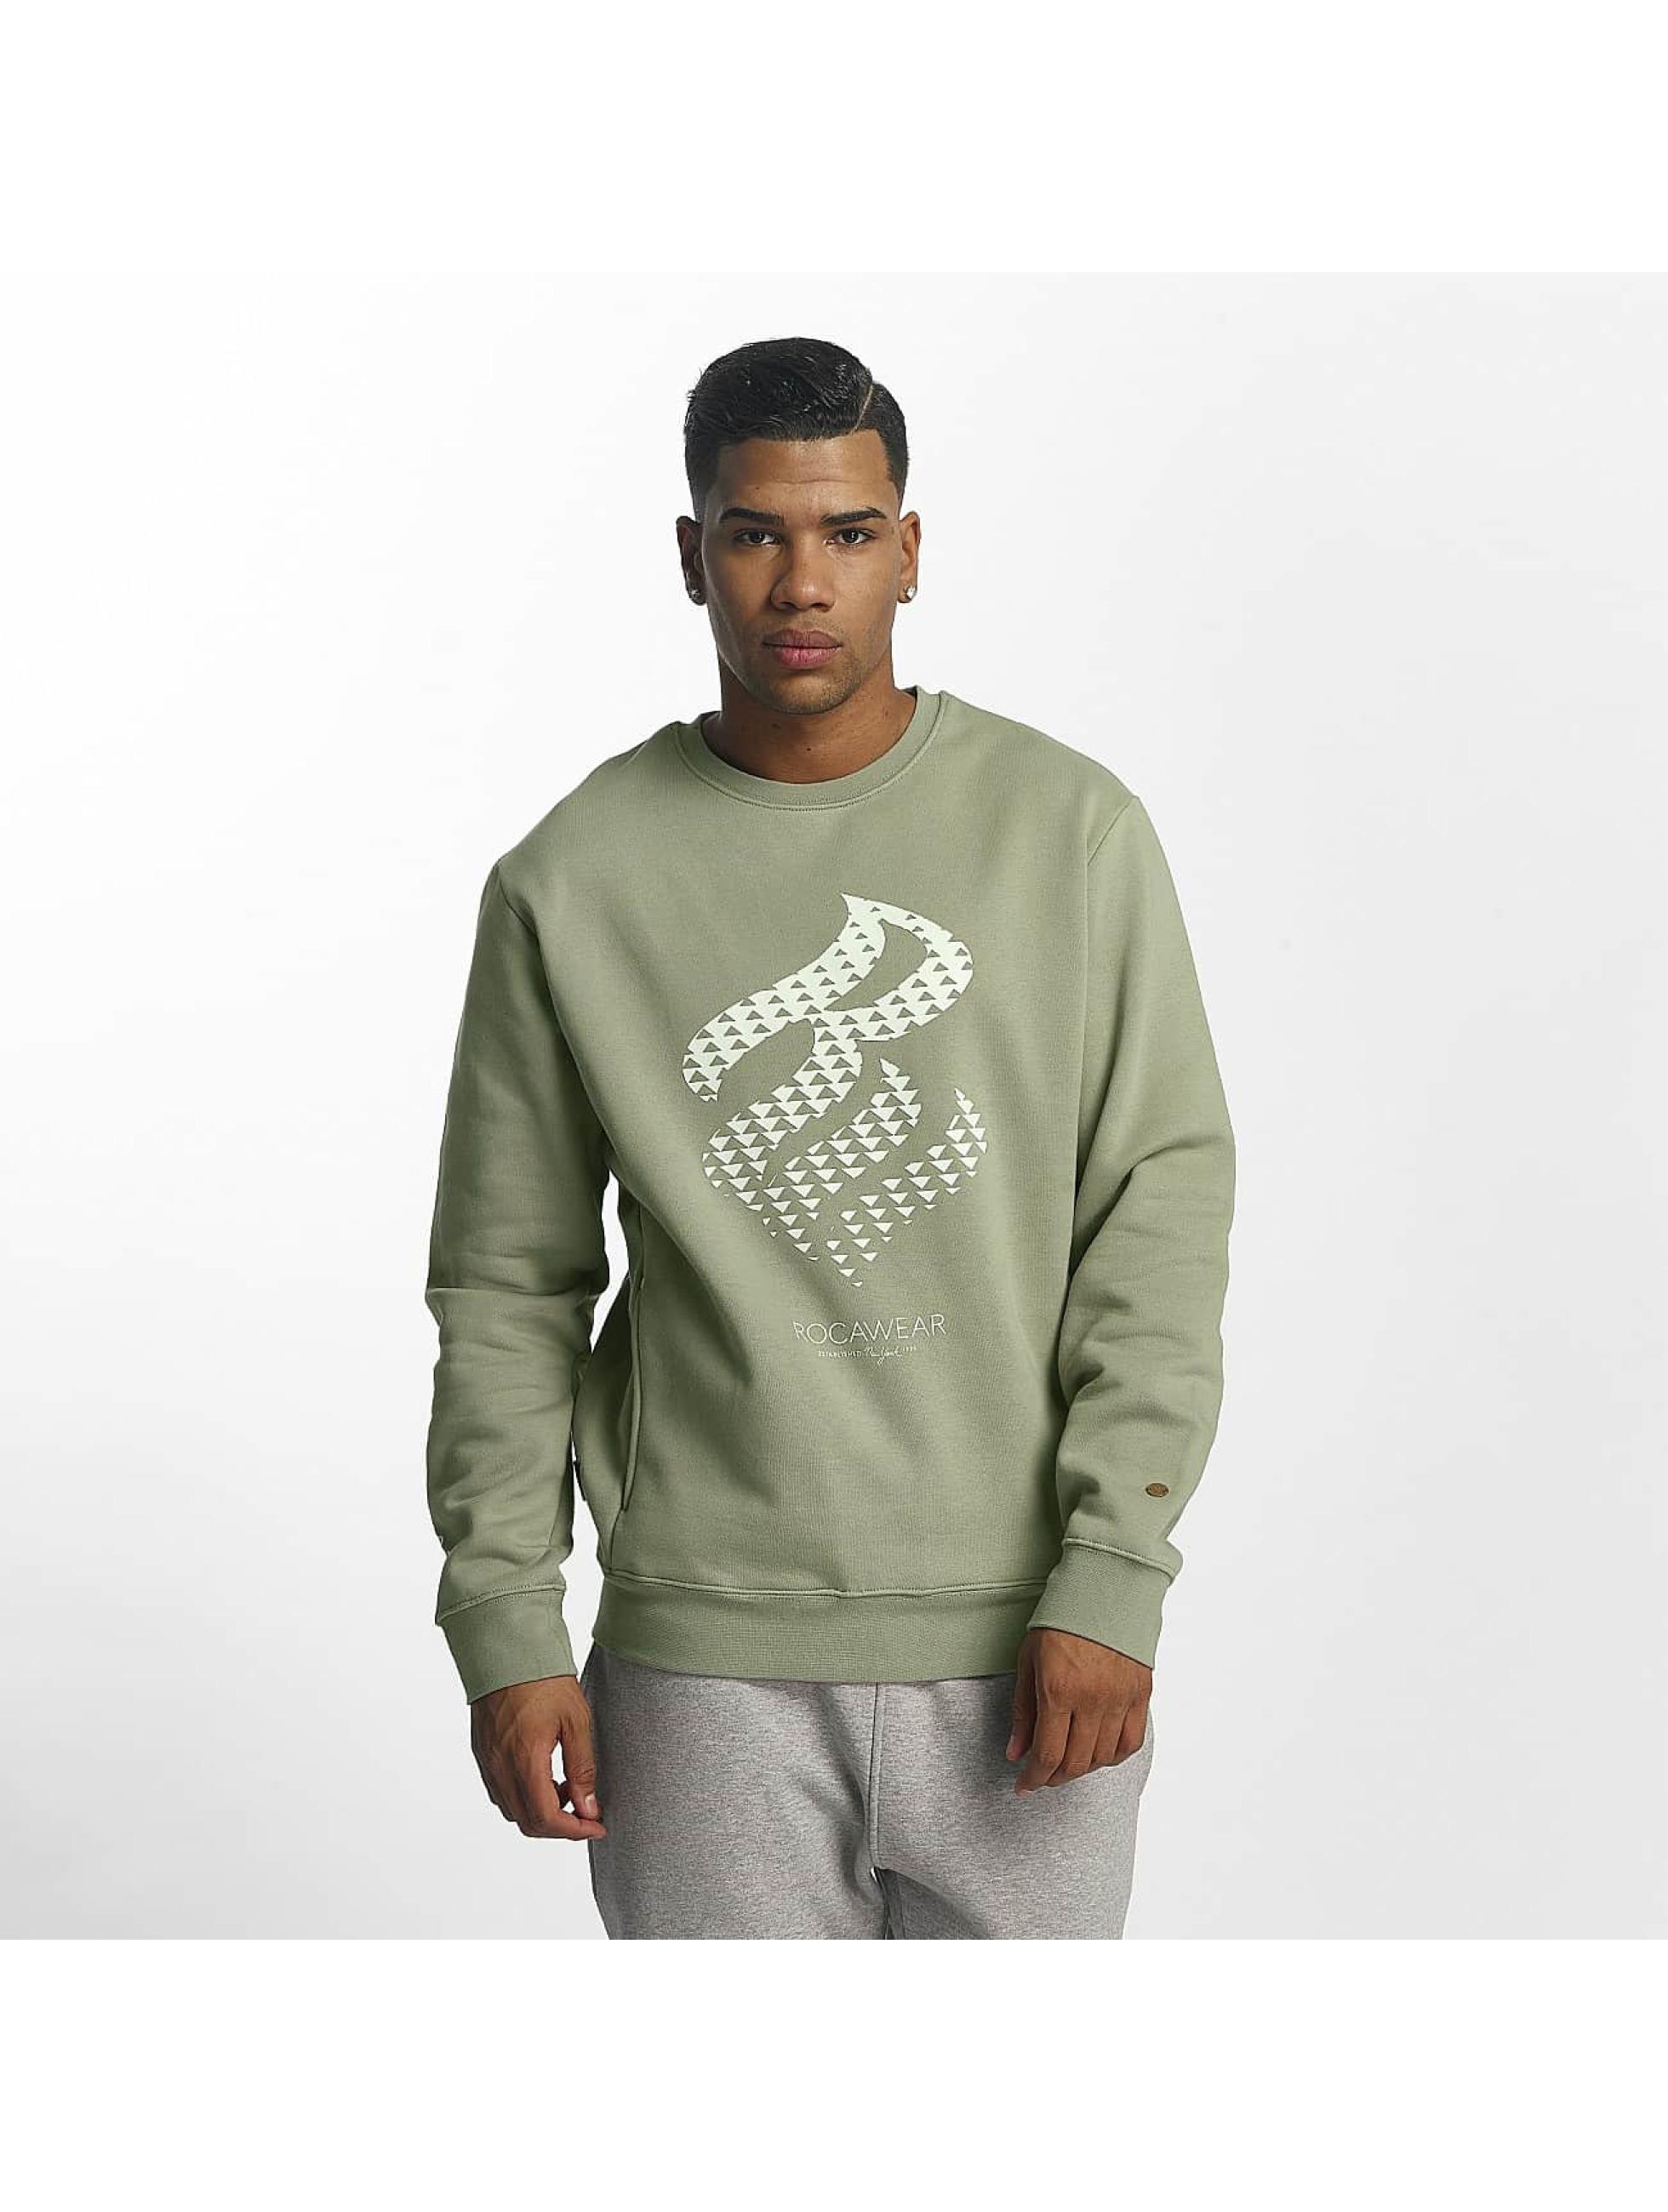 Rocawear / Jumper Triangle in grey S